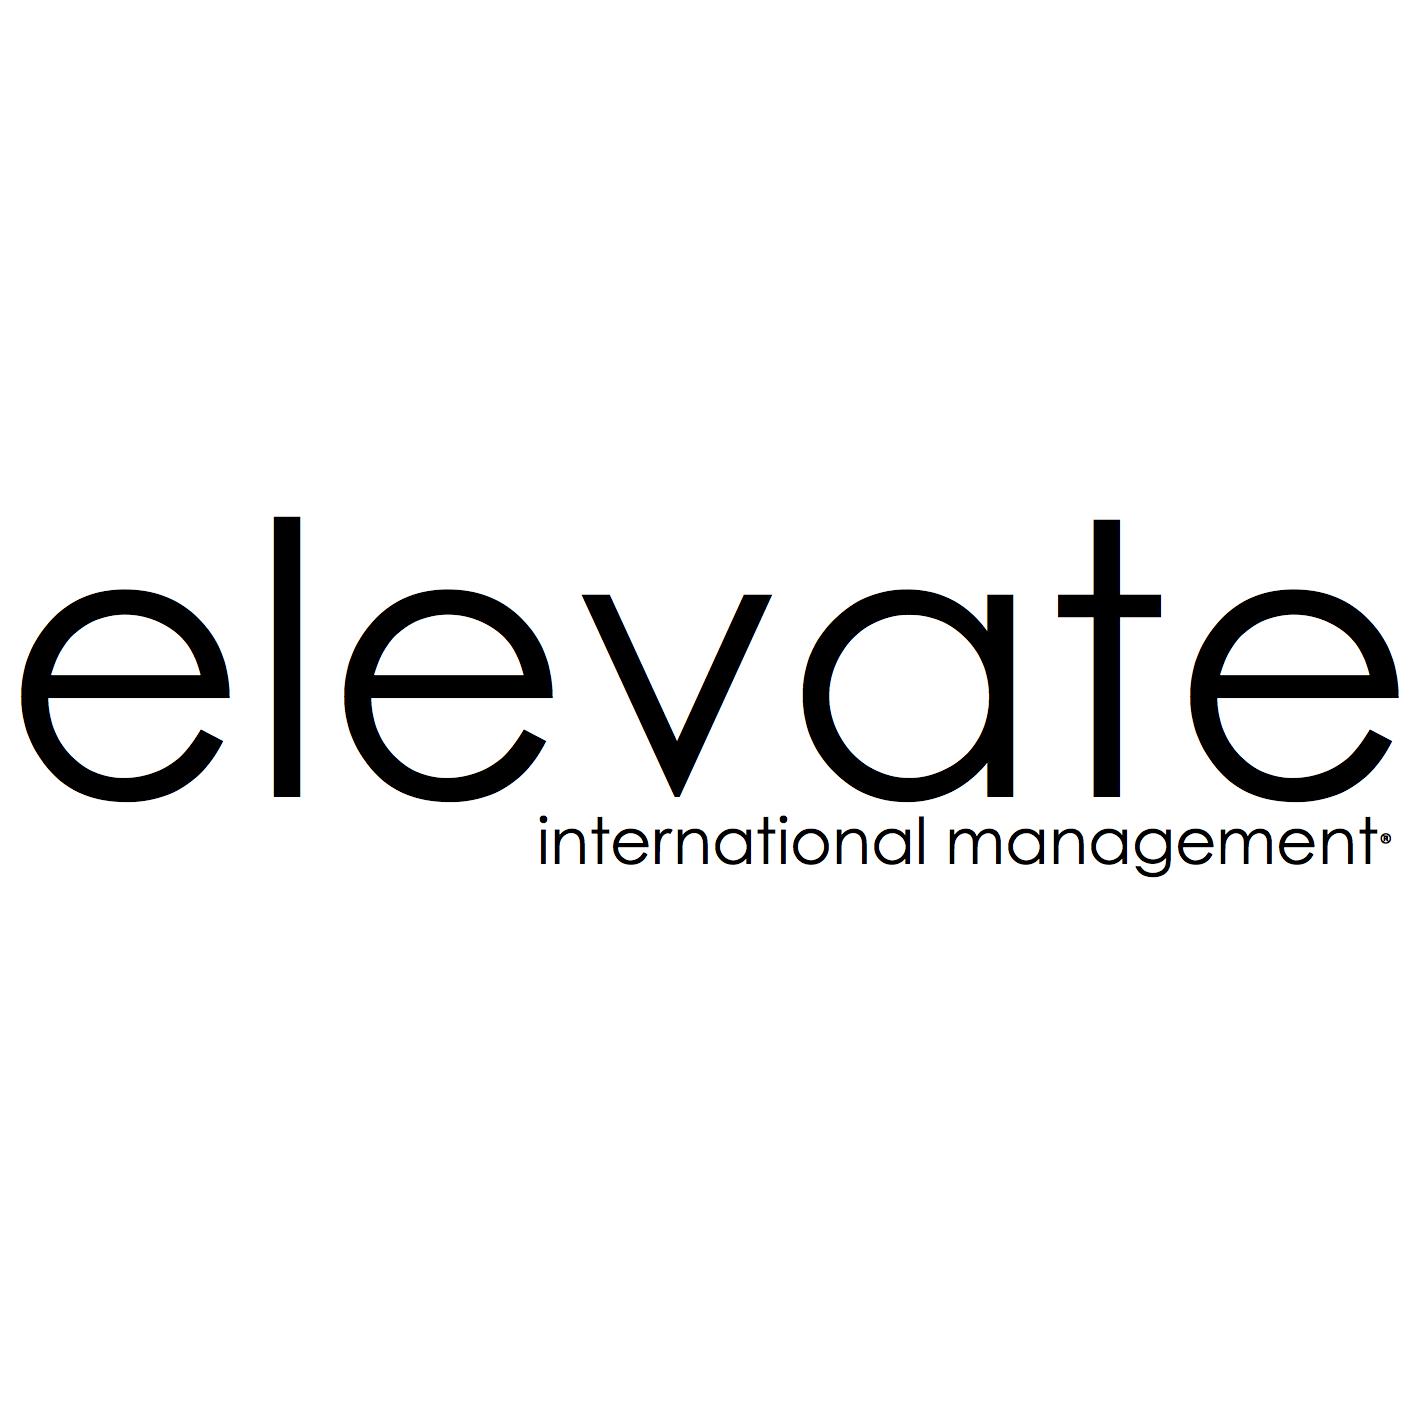 Elevate International Management